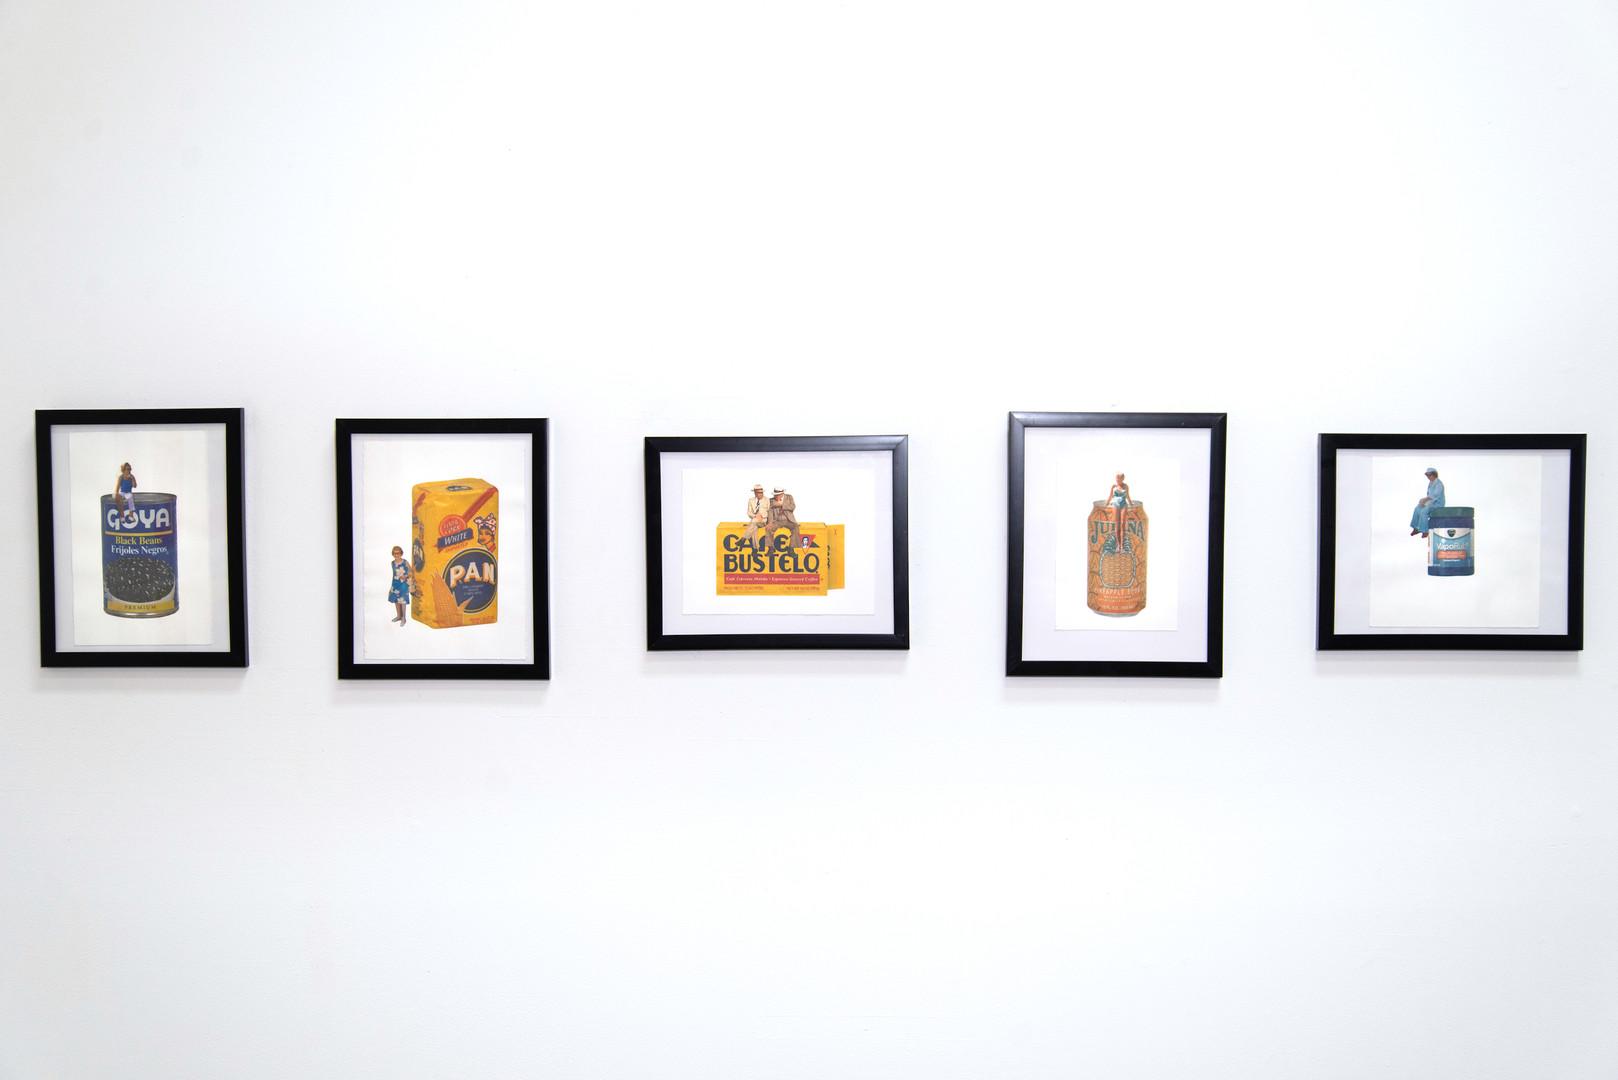 Abuelas y Abuelos Print Series